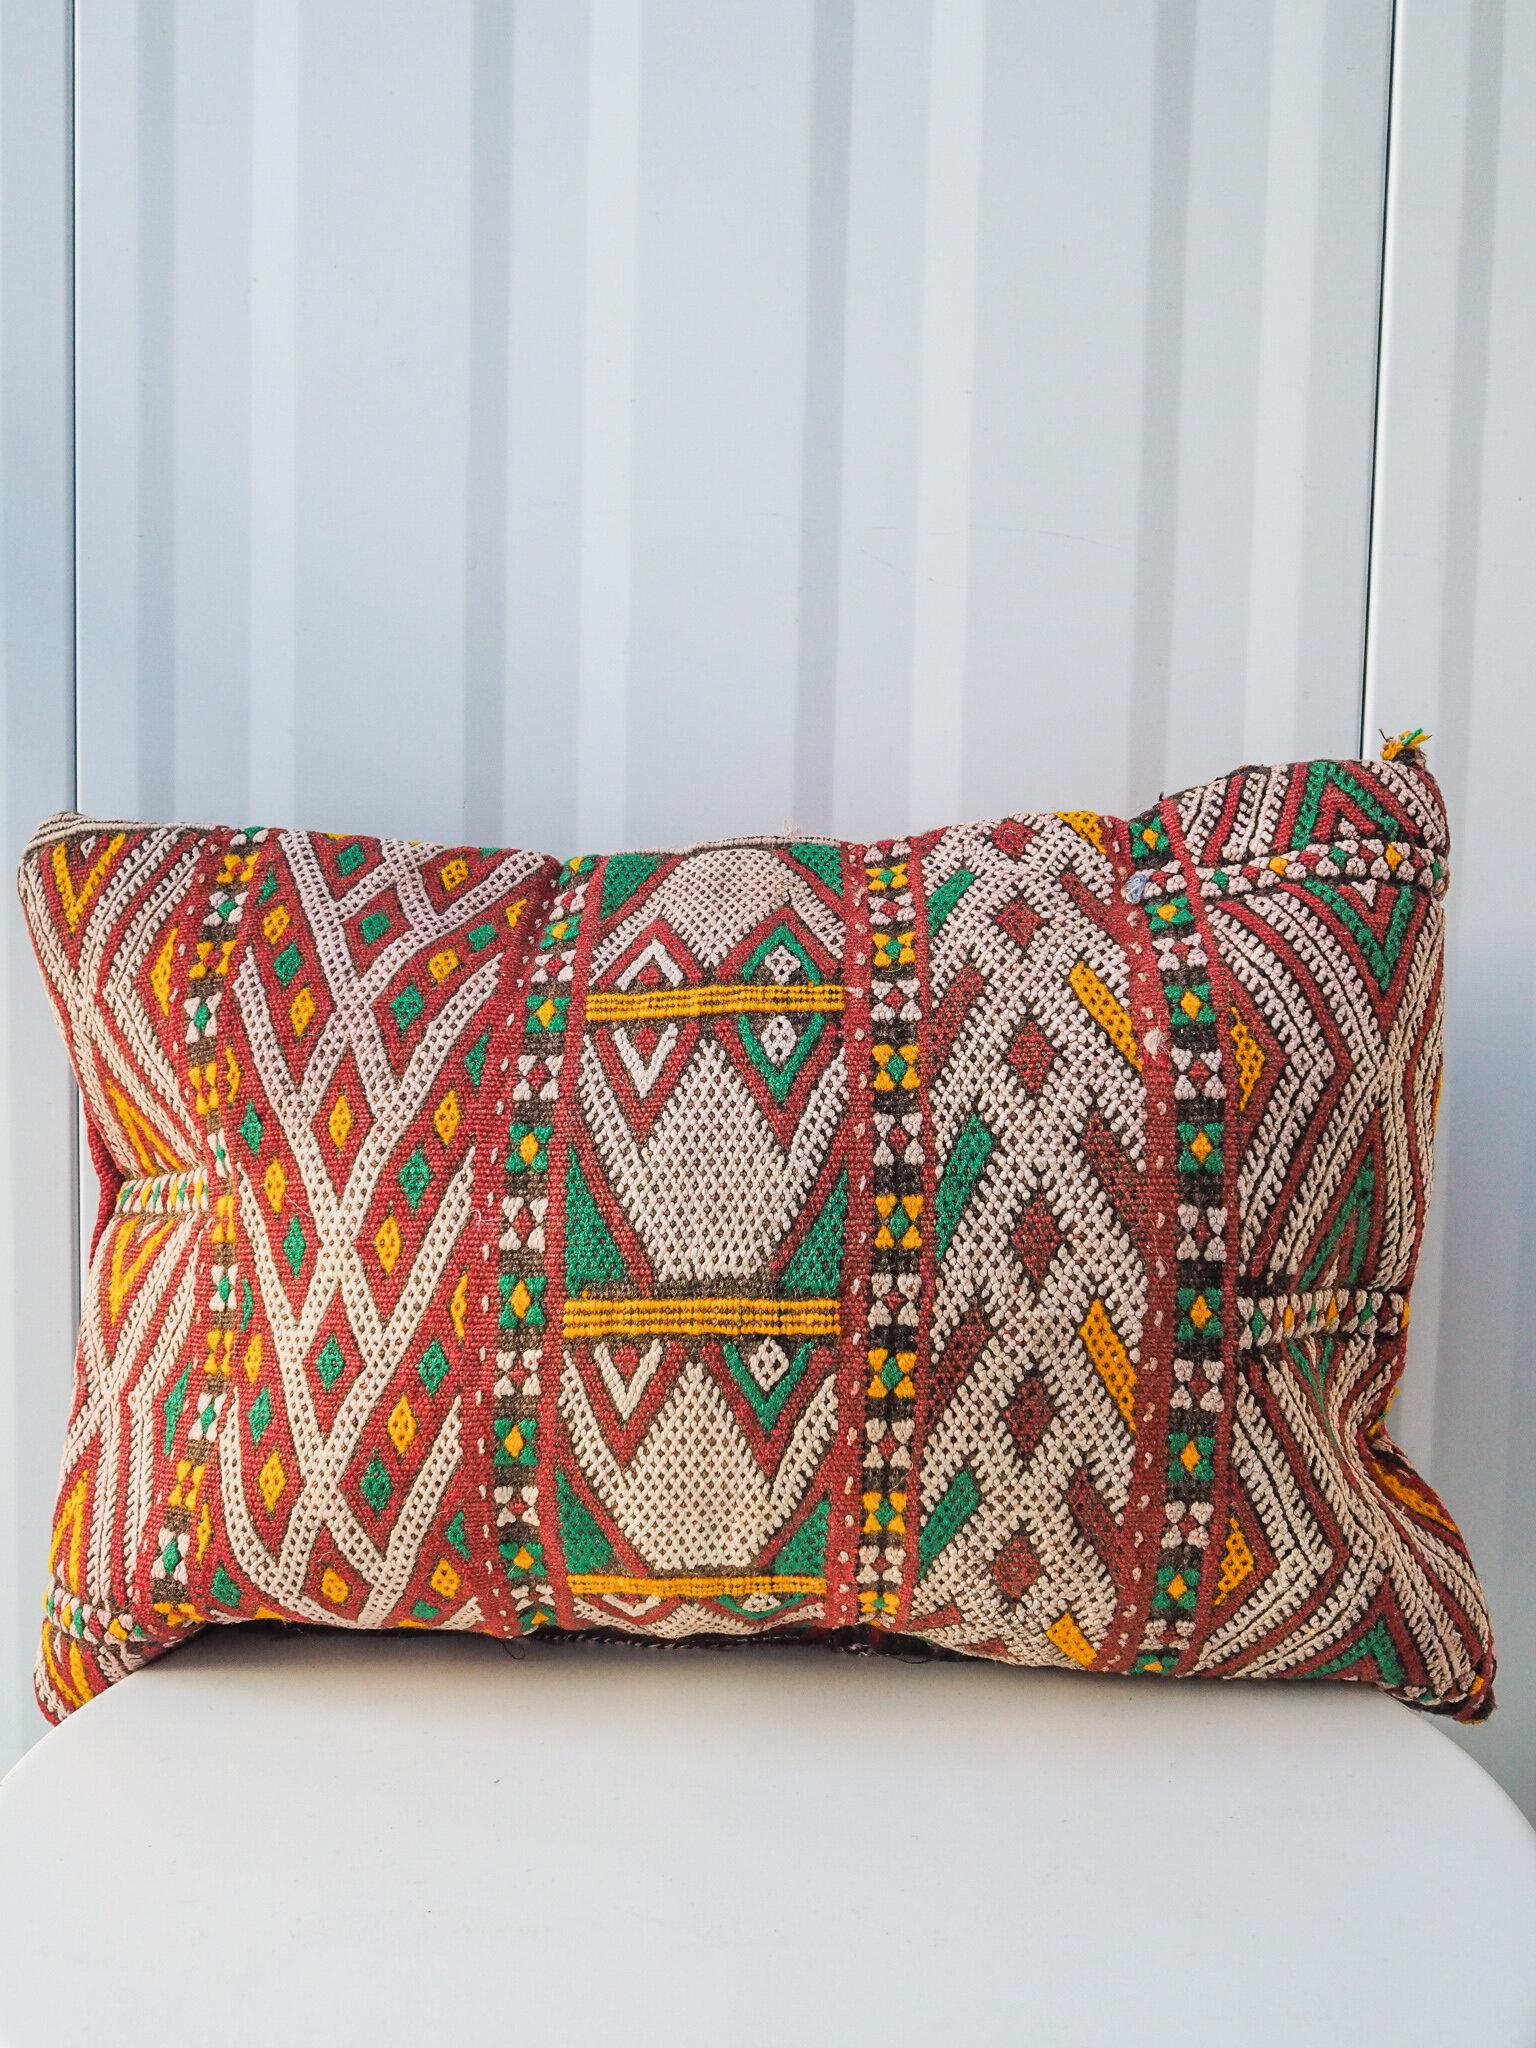 vintage moroccan kilim pillow no 9 aventyr